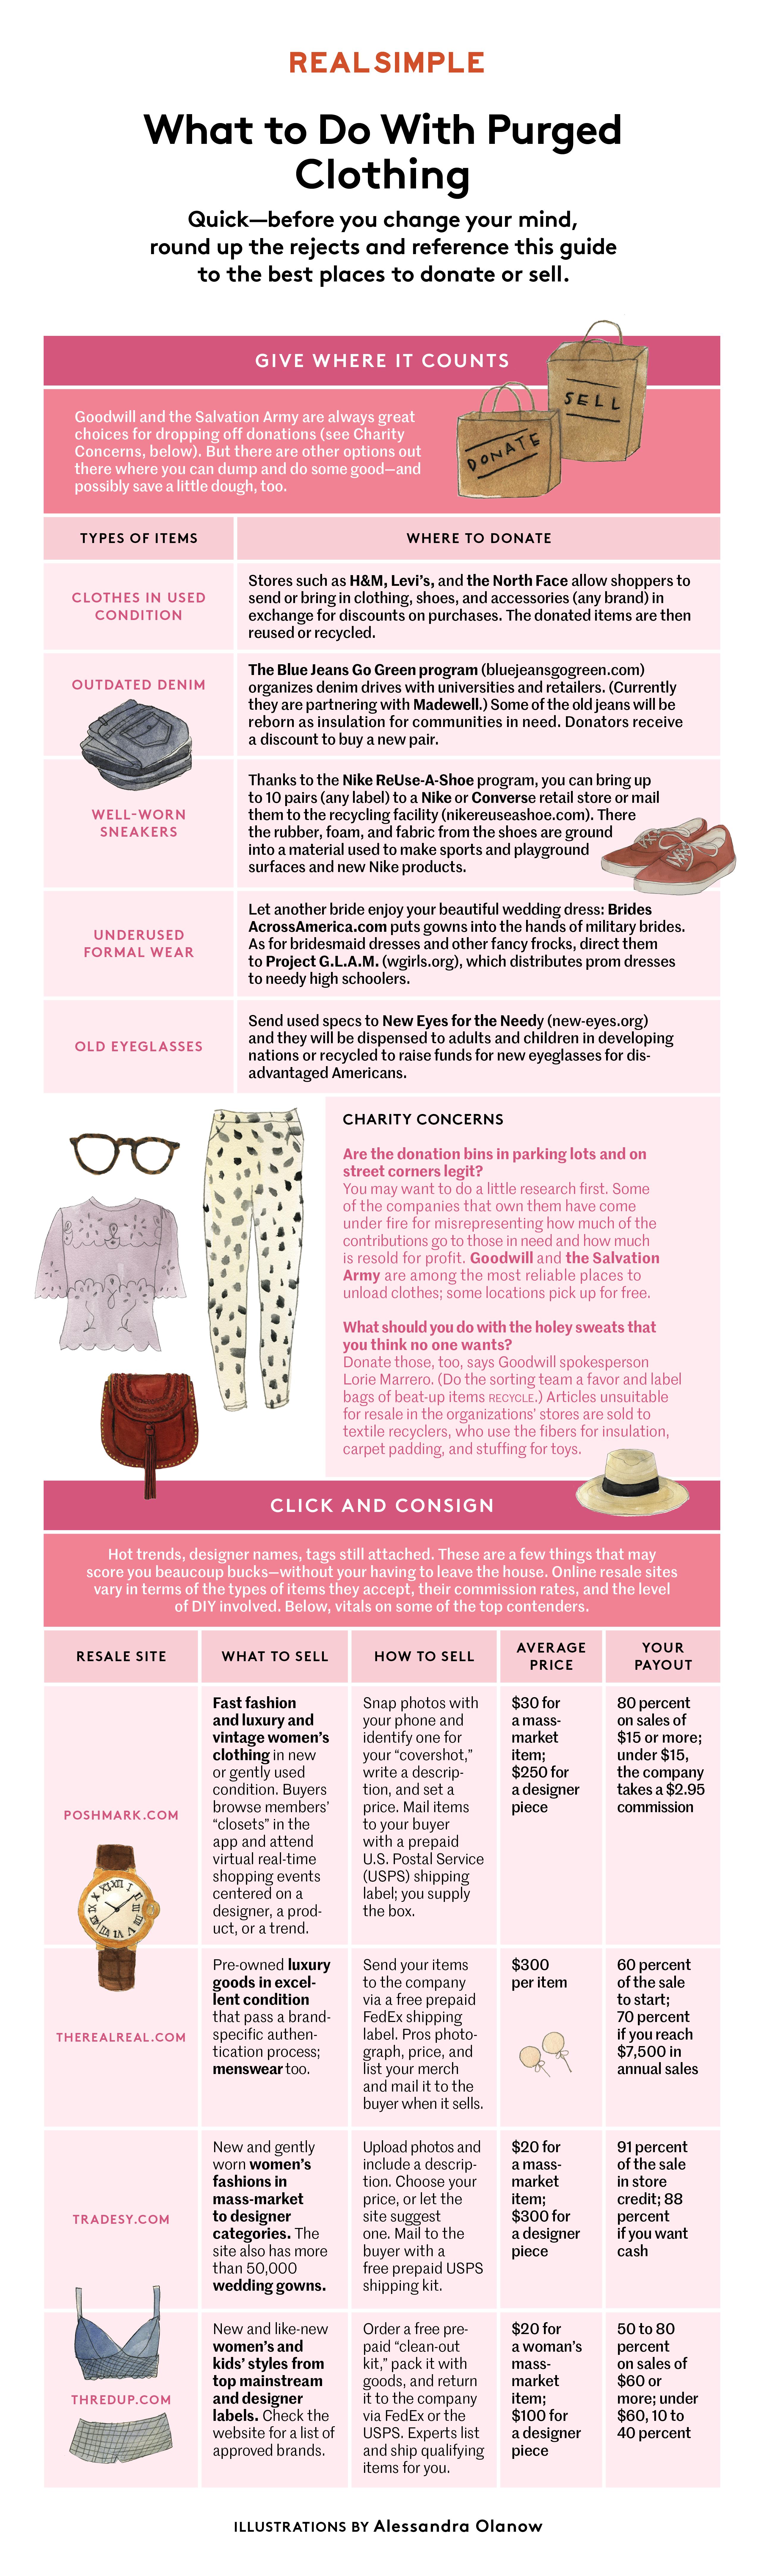 castoffs_infographic